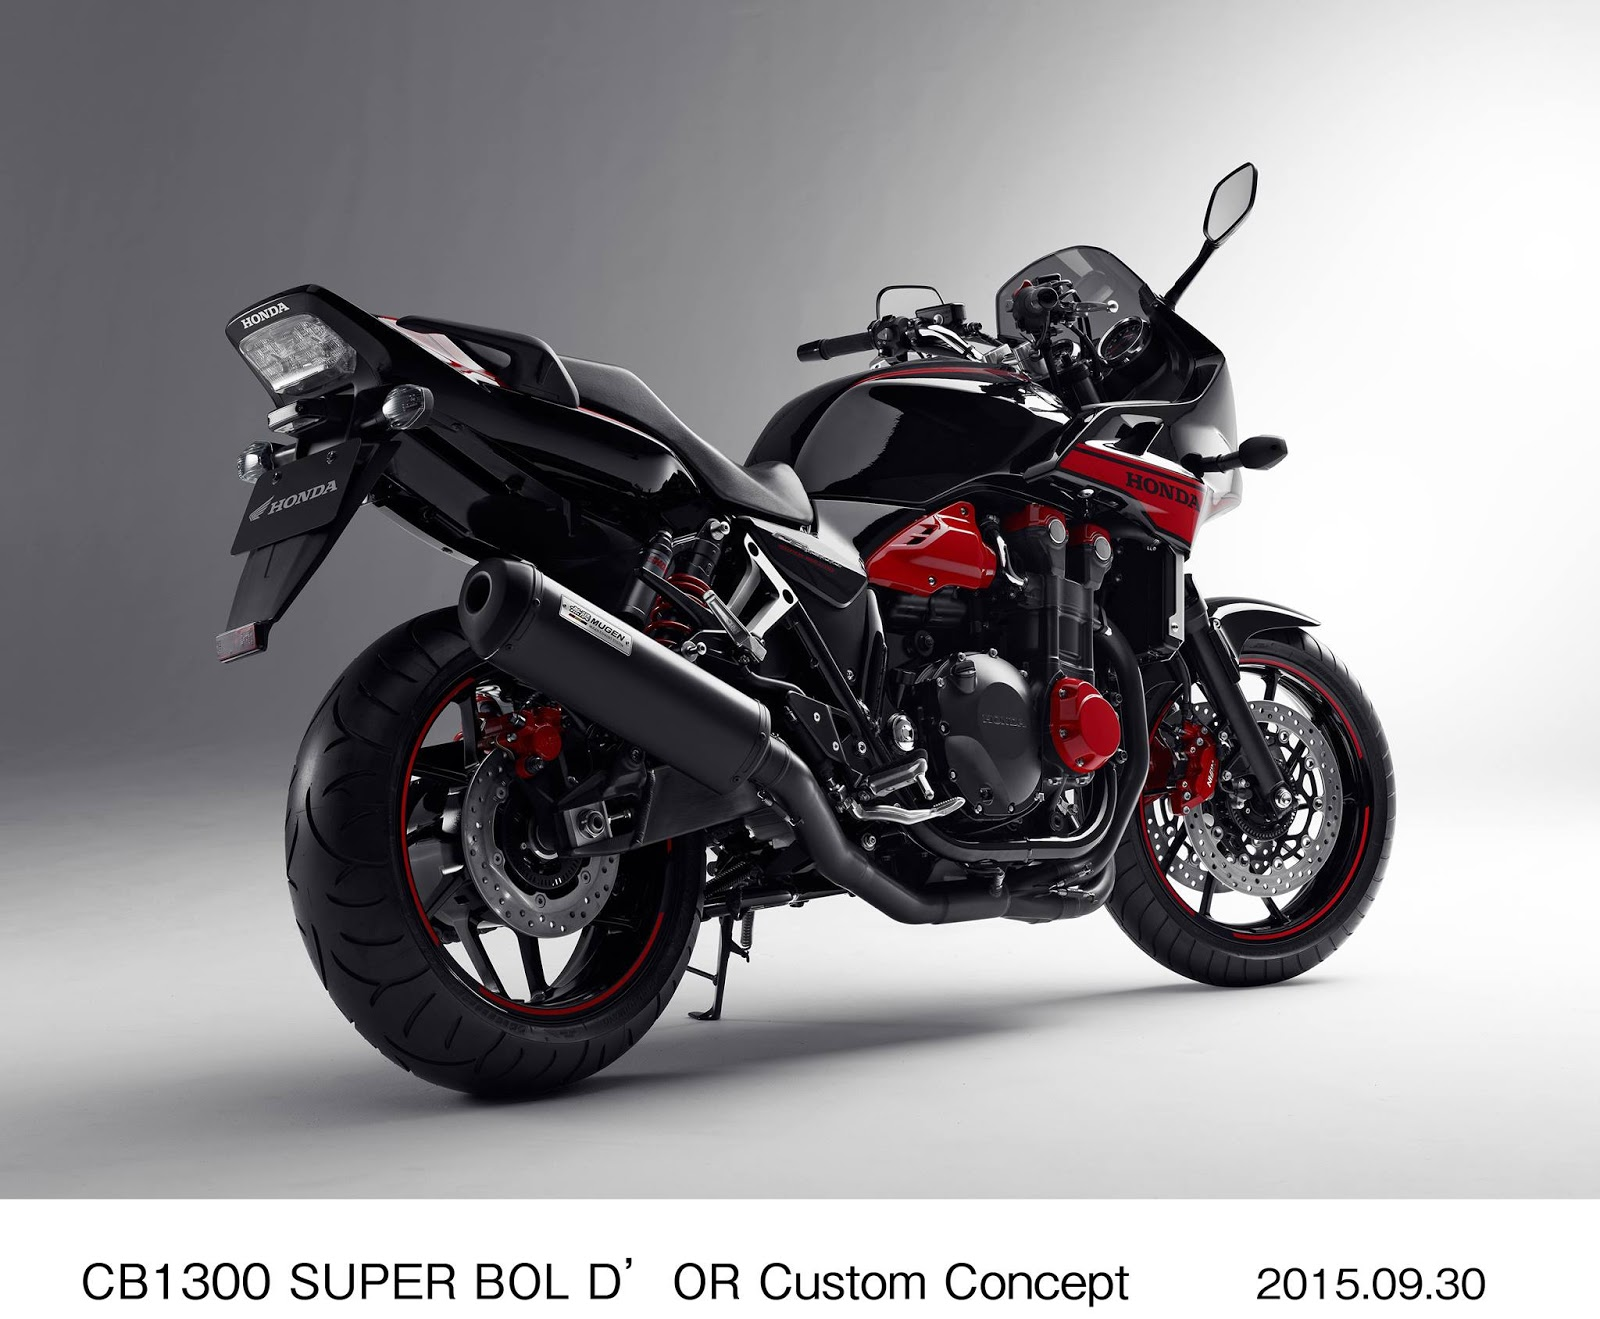 planet japan blog honda cb 1300 super bol d 39 or custom concept tokyo motorcycle show 2015. Black Bedroom Furniture Sets. Home Design Ideas